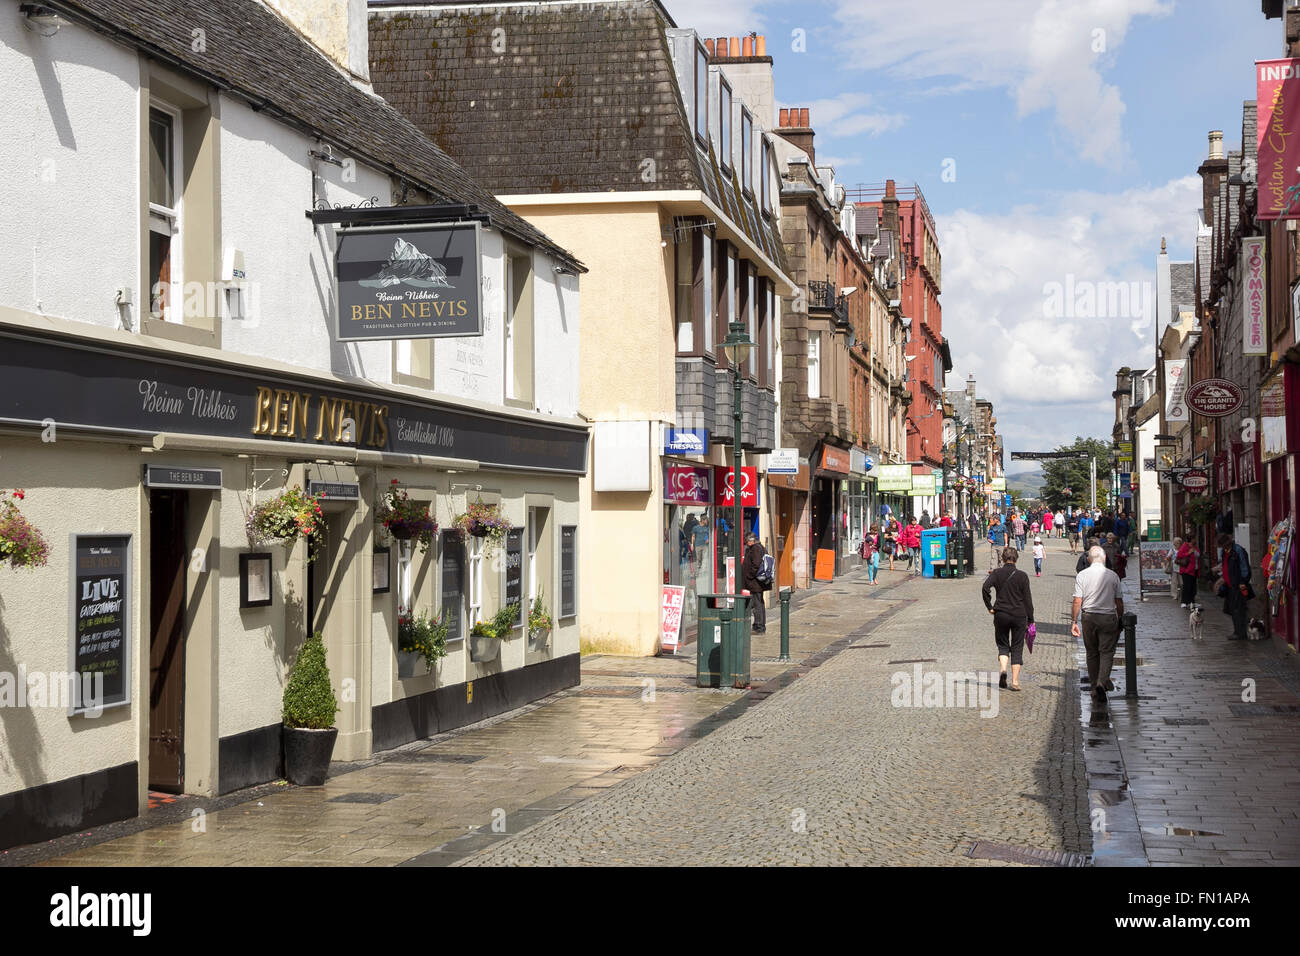 The High Street in Fort William, Lochaber, Highland, Scotland Stock Photo